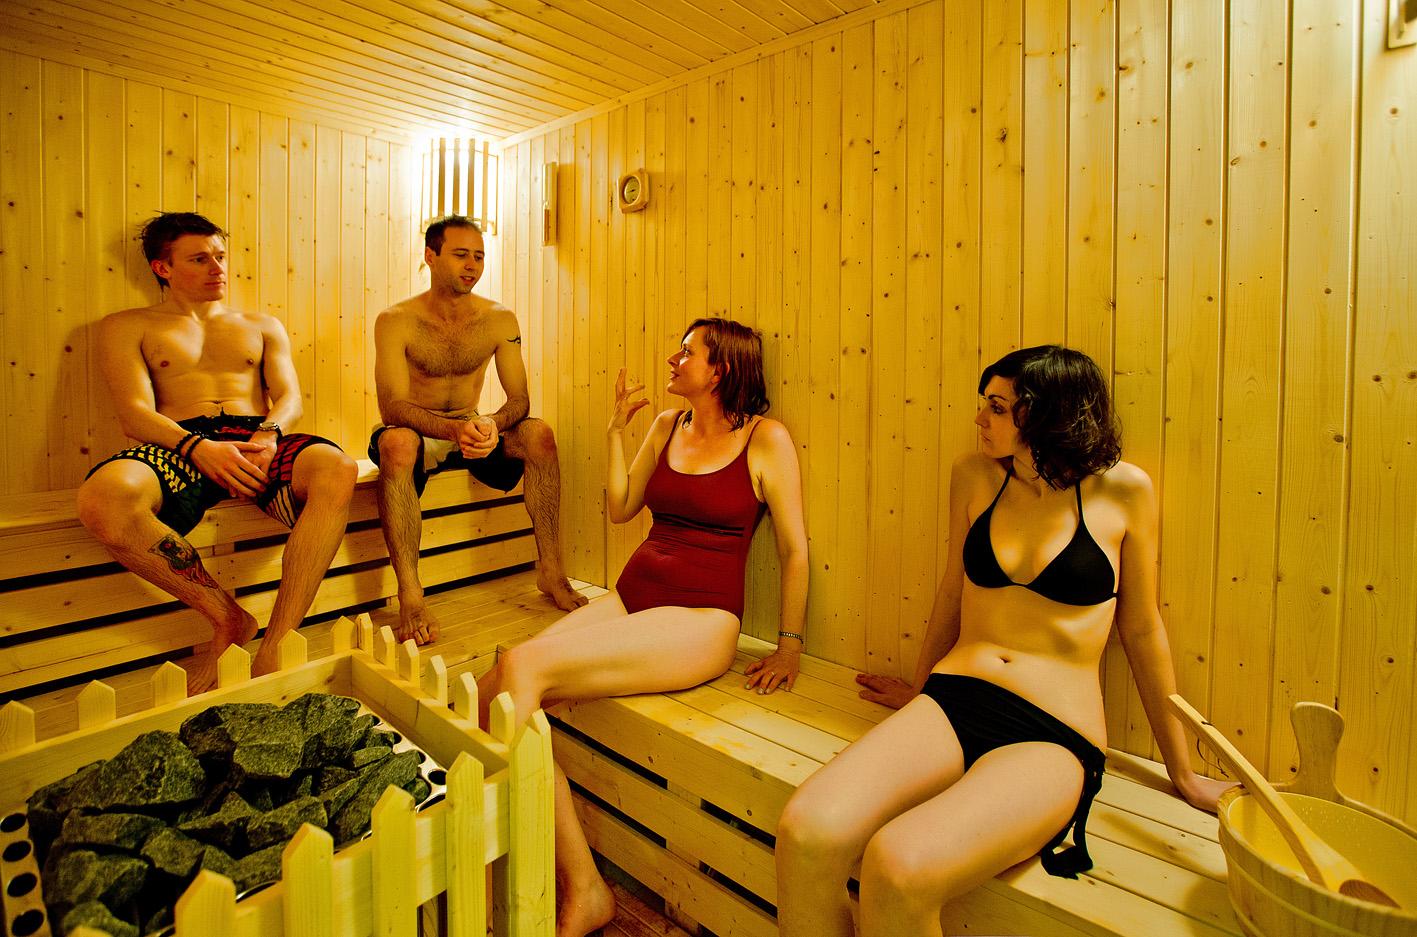 President Cruises President No. 8 Sauna.jpg